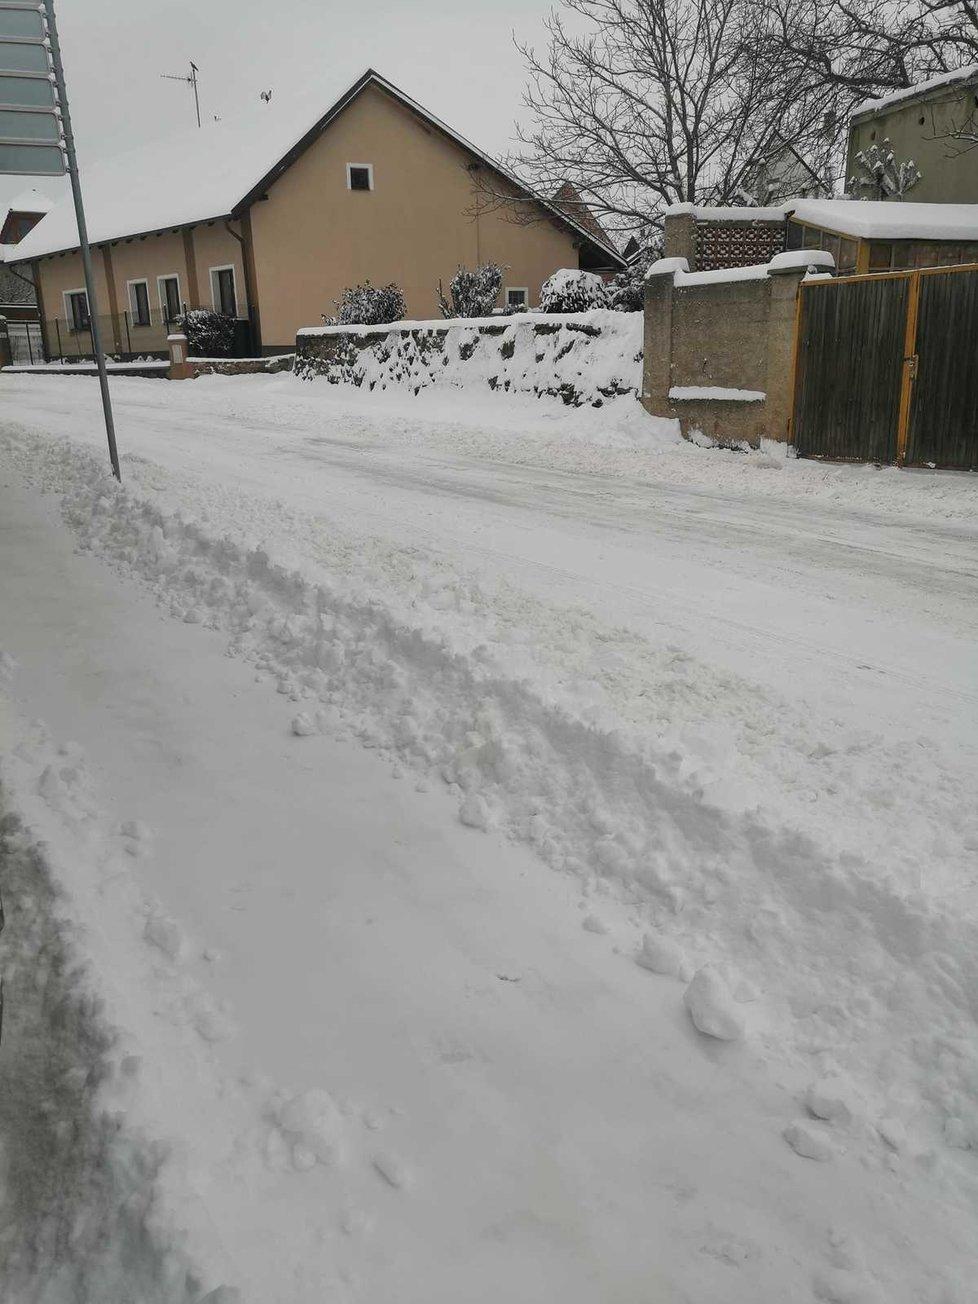 Sníh v Plaňanech u Kolína, 8. února 2021.